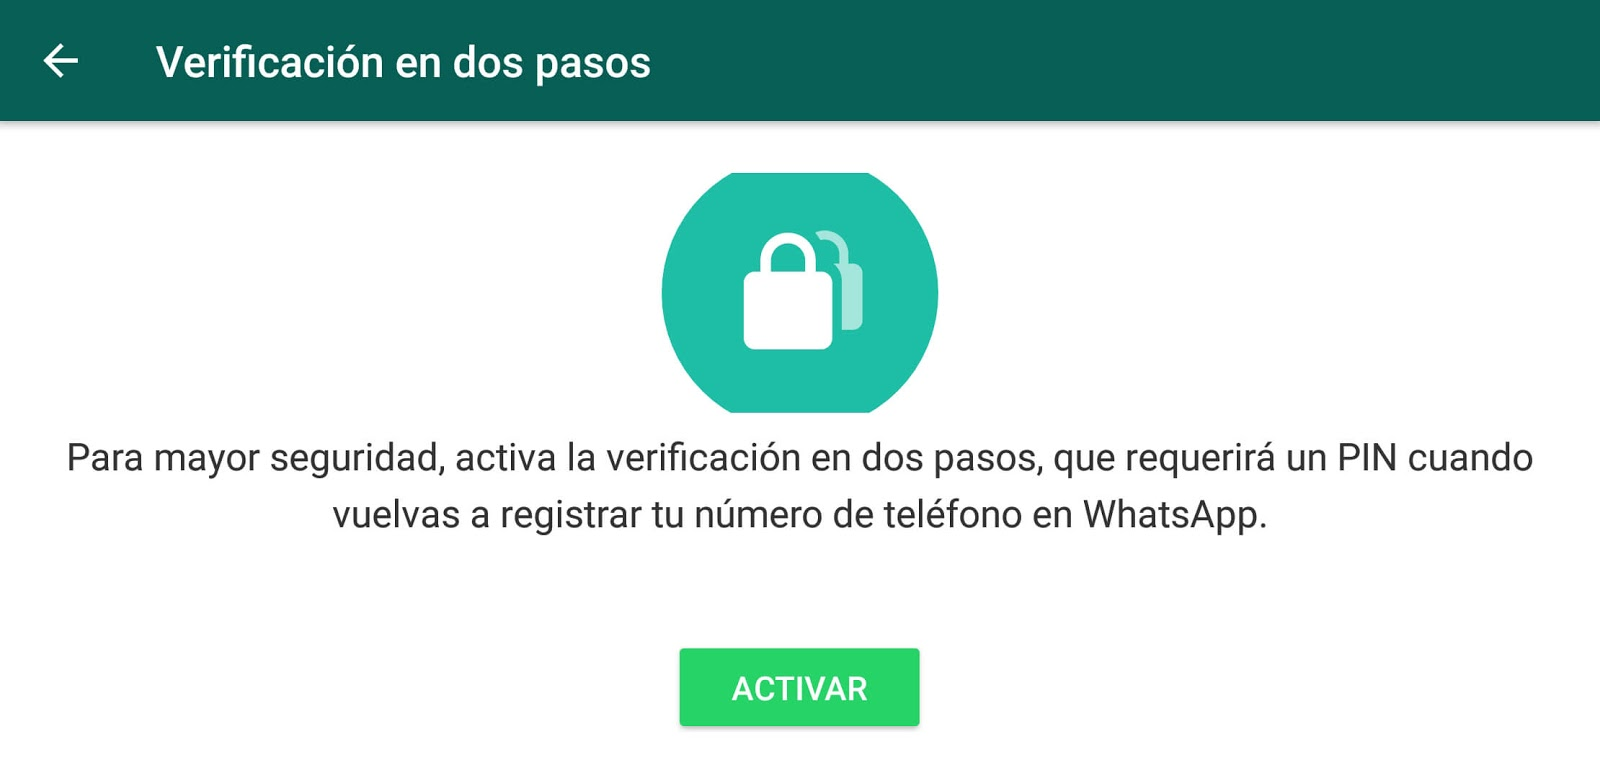 La pantalla de verificación de dos pasos en WhatsApp